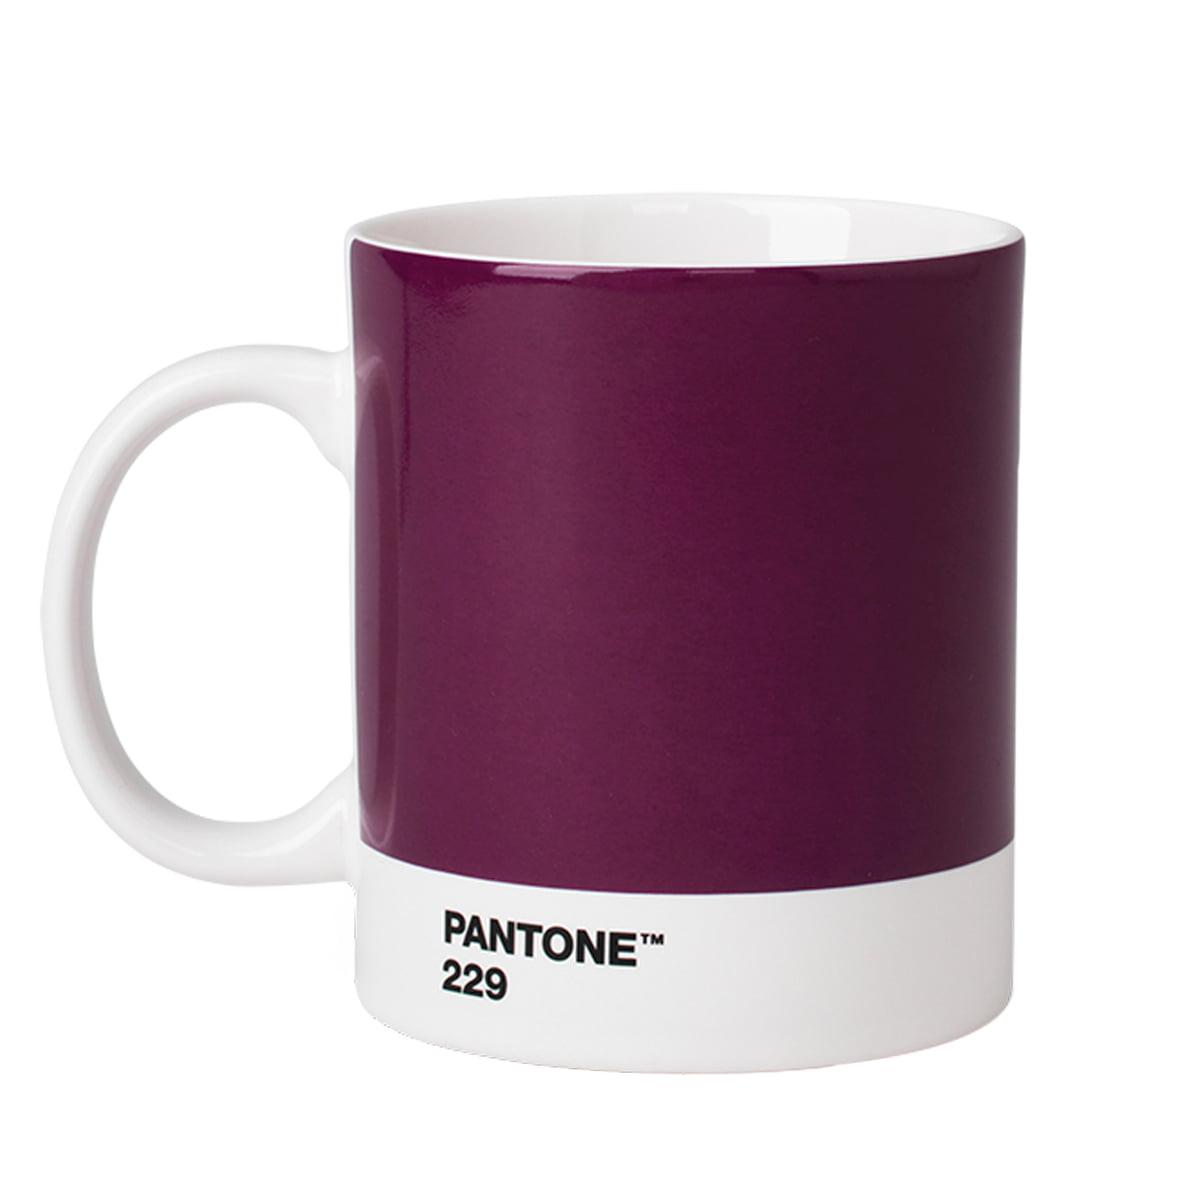 pantone becher pantone universe shop. Black Bedroom Furniture Sets. Home Design Ideas